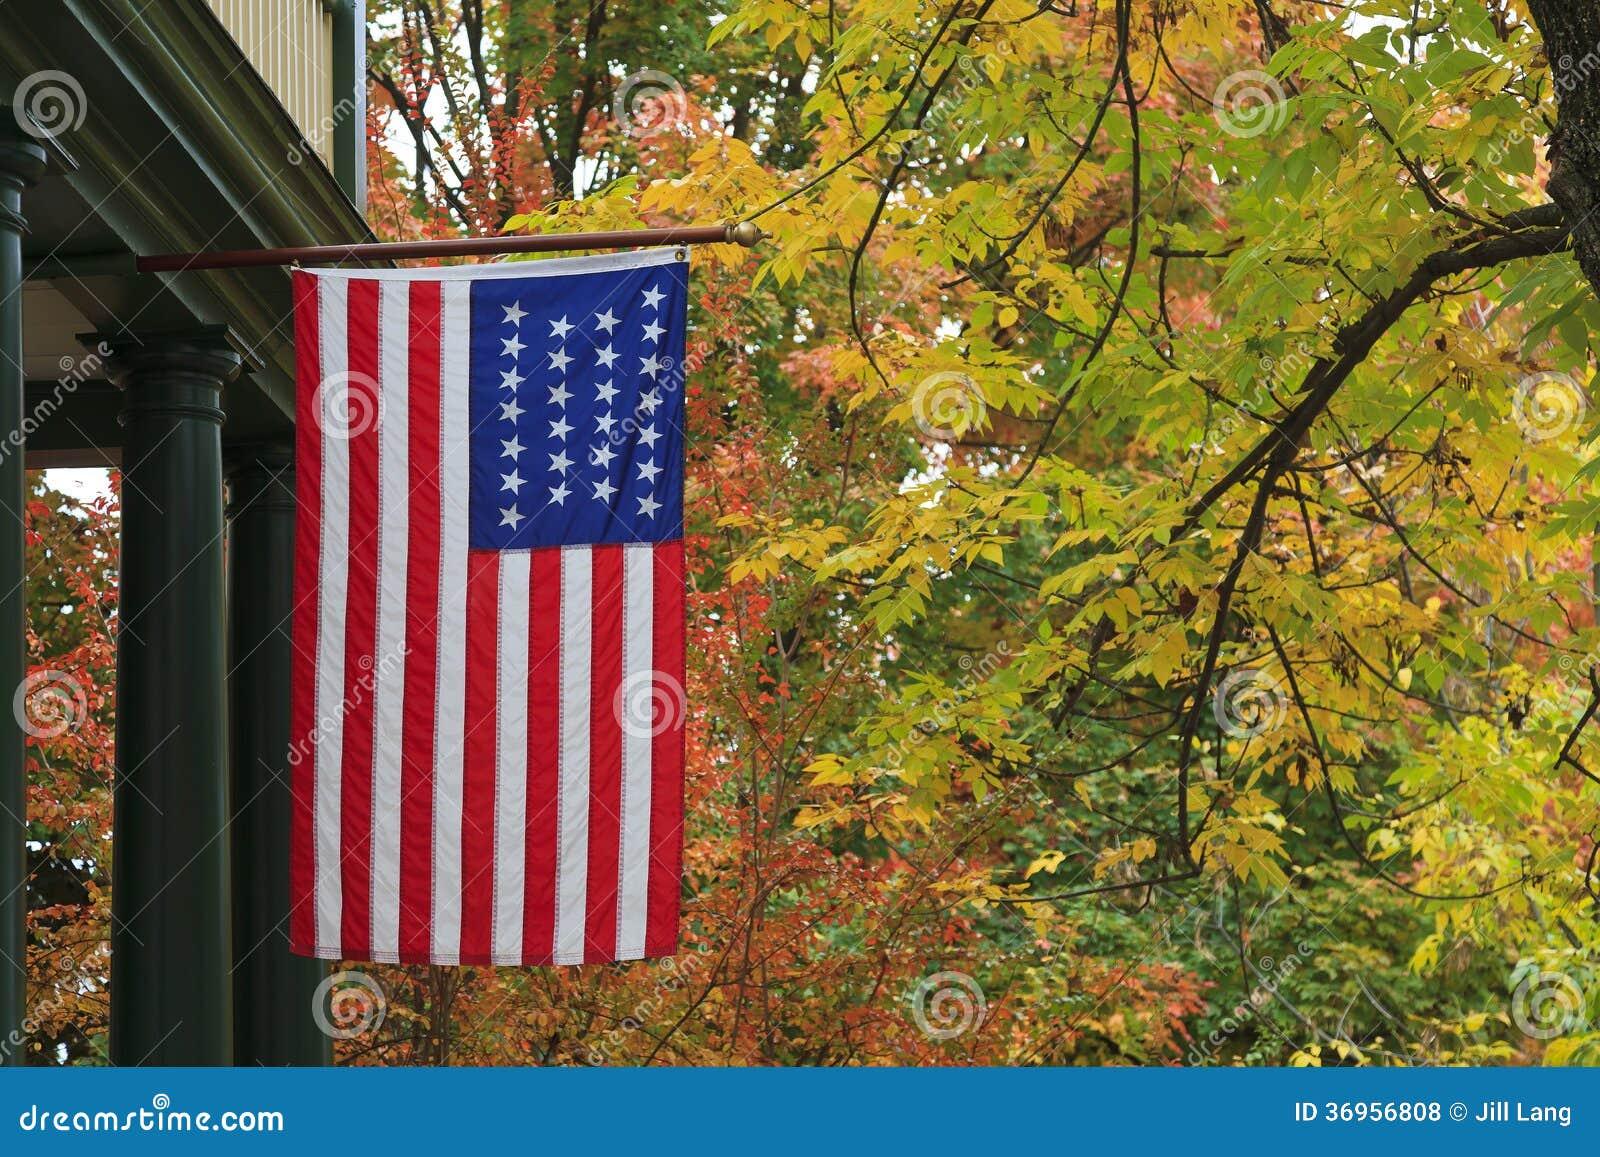 26 Star American Flag Royalty Free Stock Photos Image